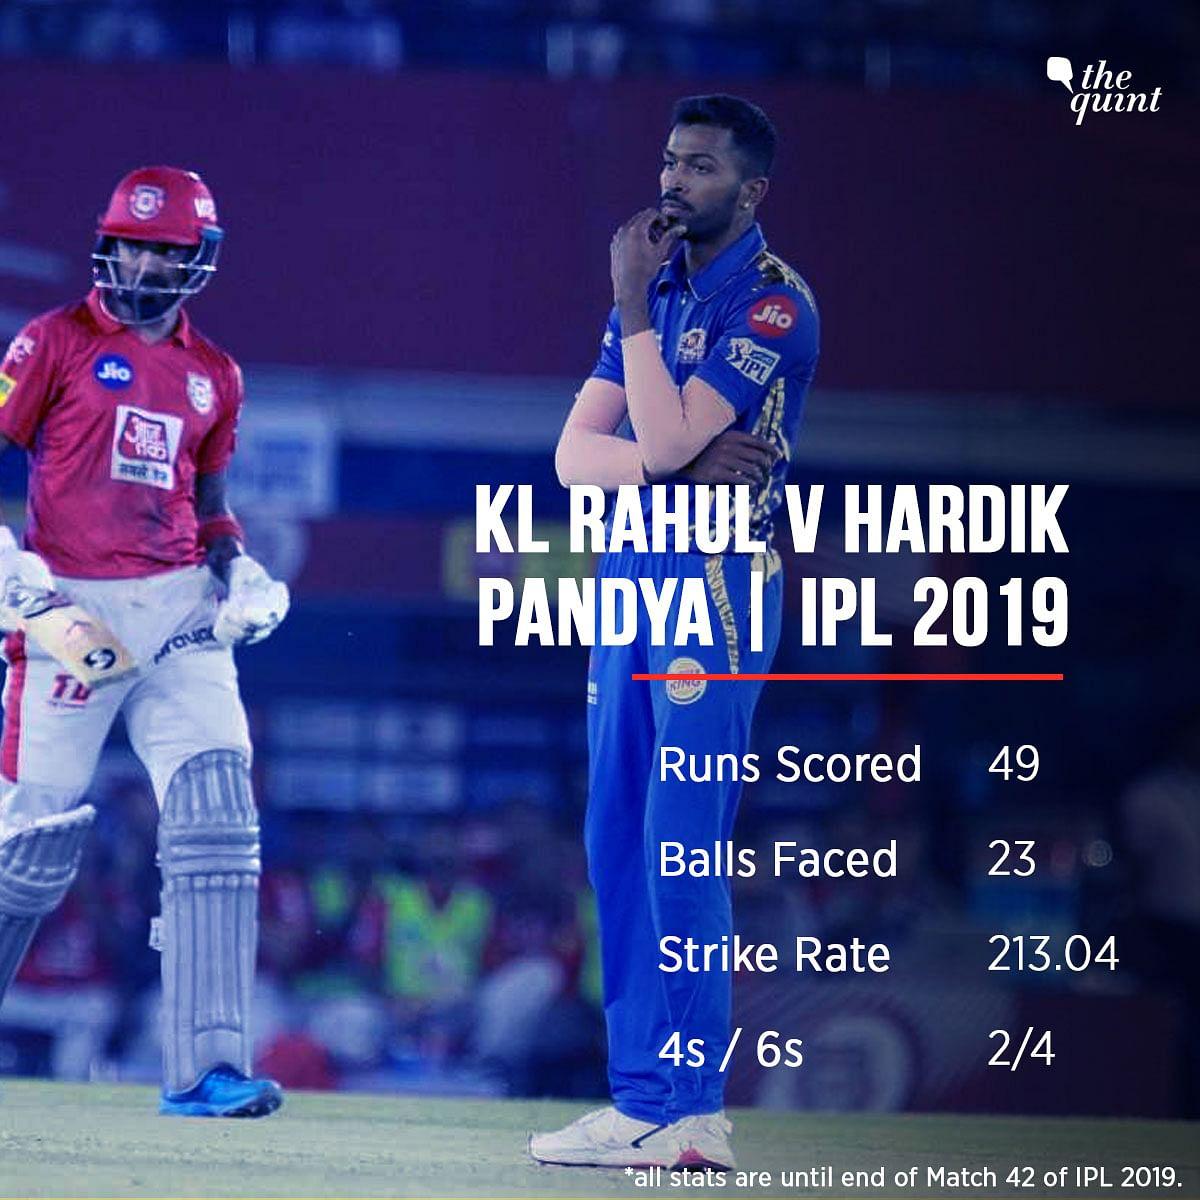 Hardik vs Rahul, Binny on Top: 7 Interesting Trivia from IPL 2019